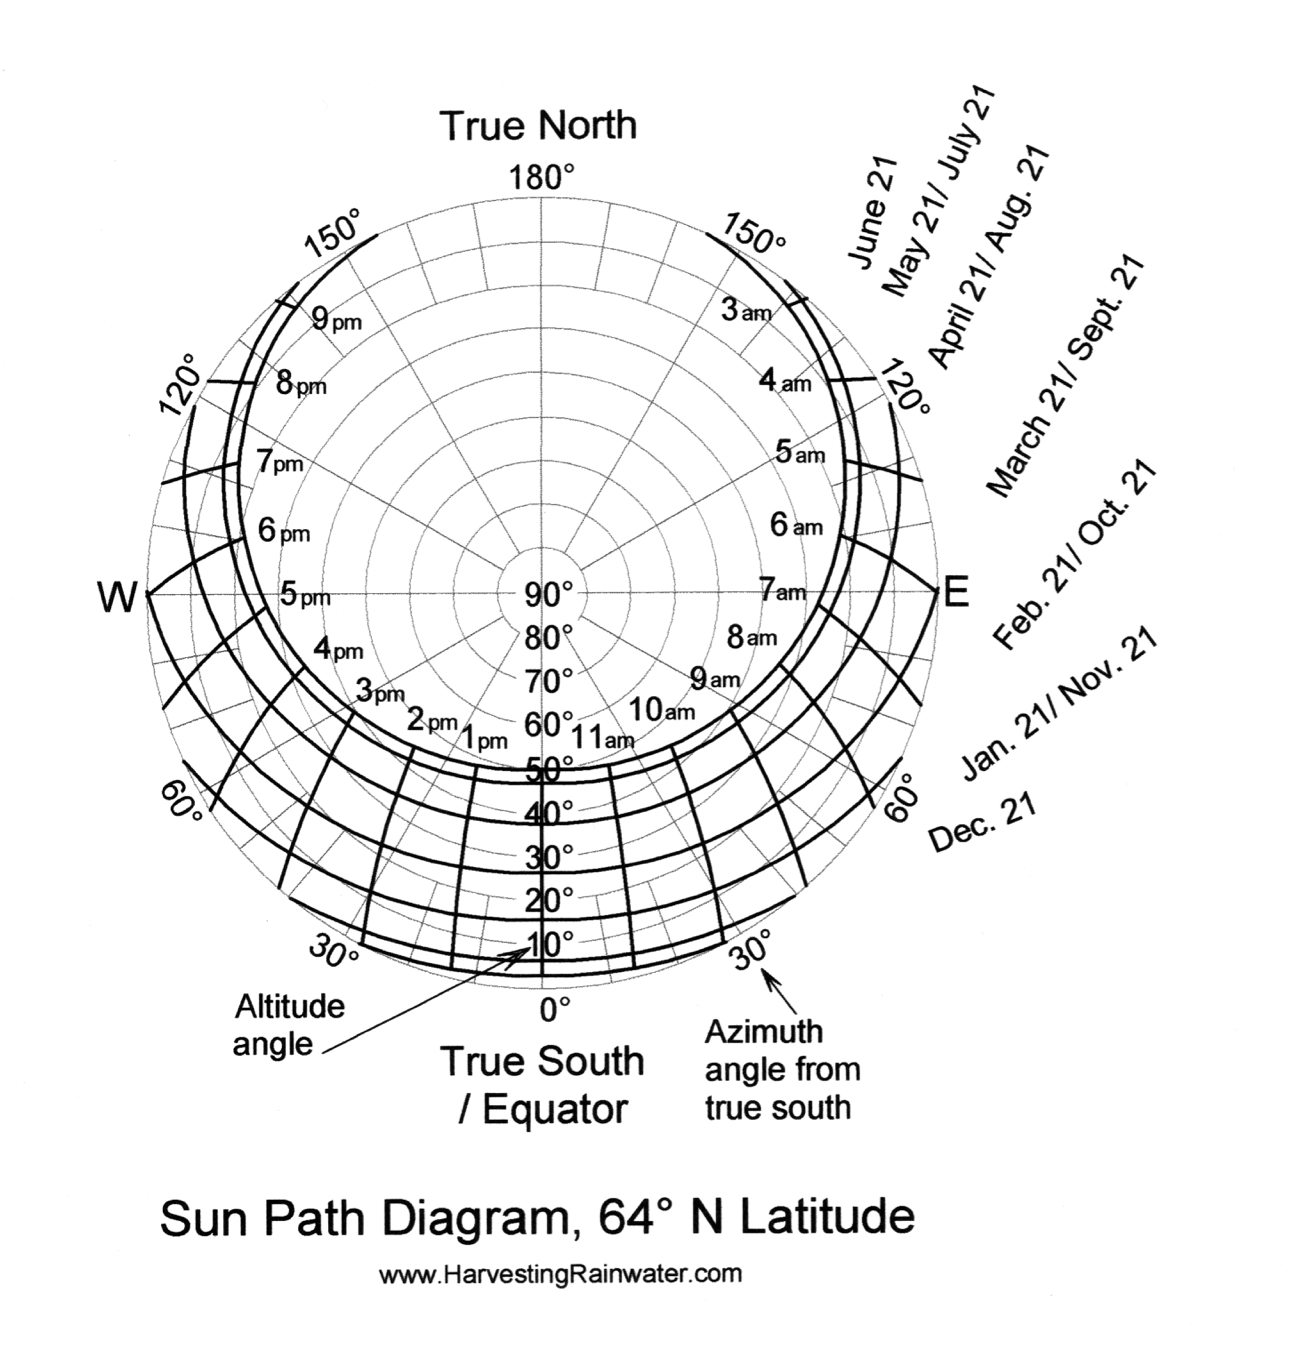 hight resolution of sun path diagram 64 n latitude